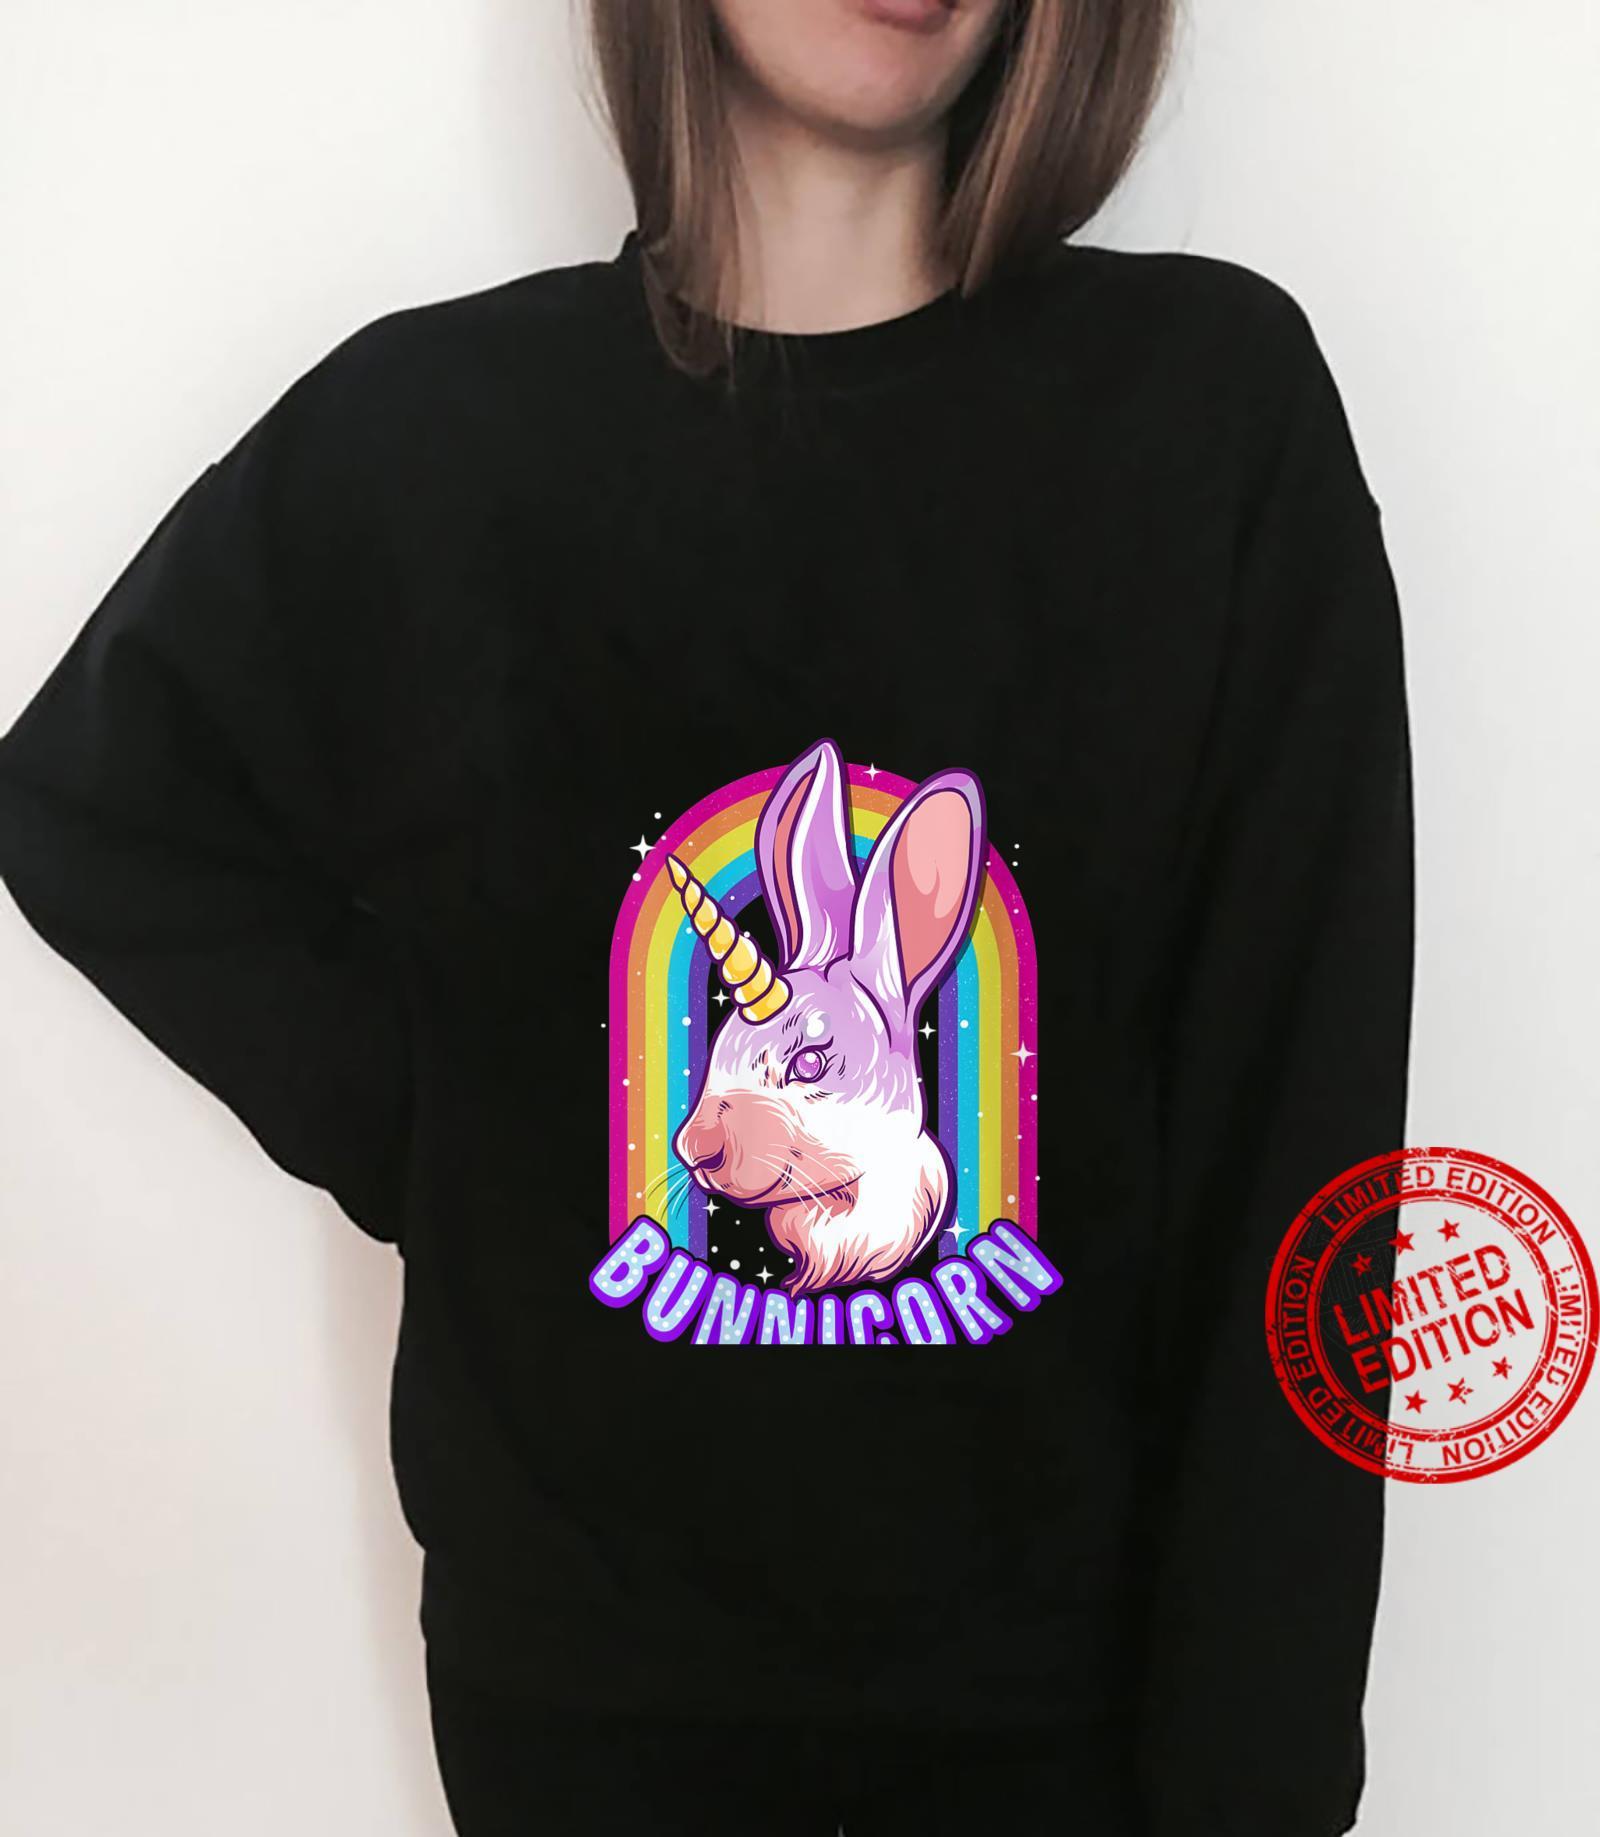 Womens Bunnicorn Rainbow Cute Bunny Rabbit Unicorn Shirt sweater